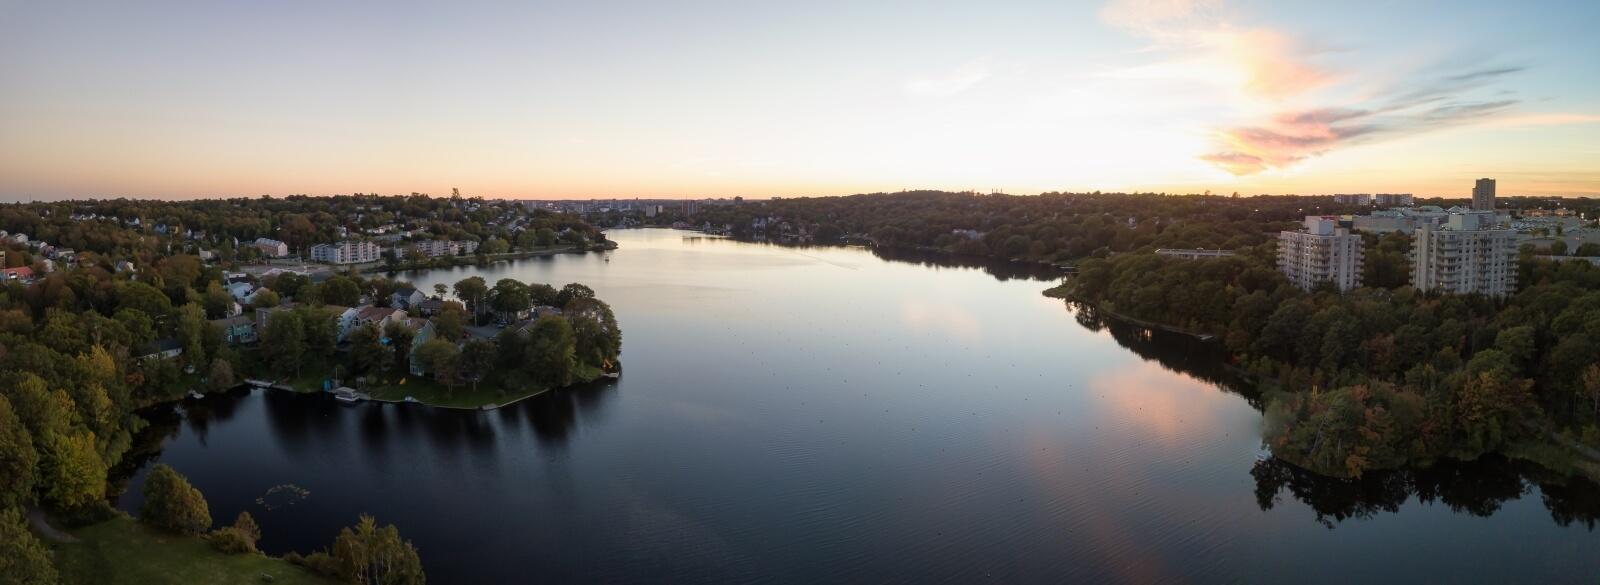 View of a lake in Dartmouth, Nova Scotia